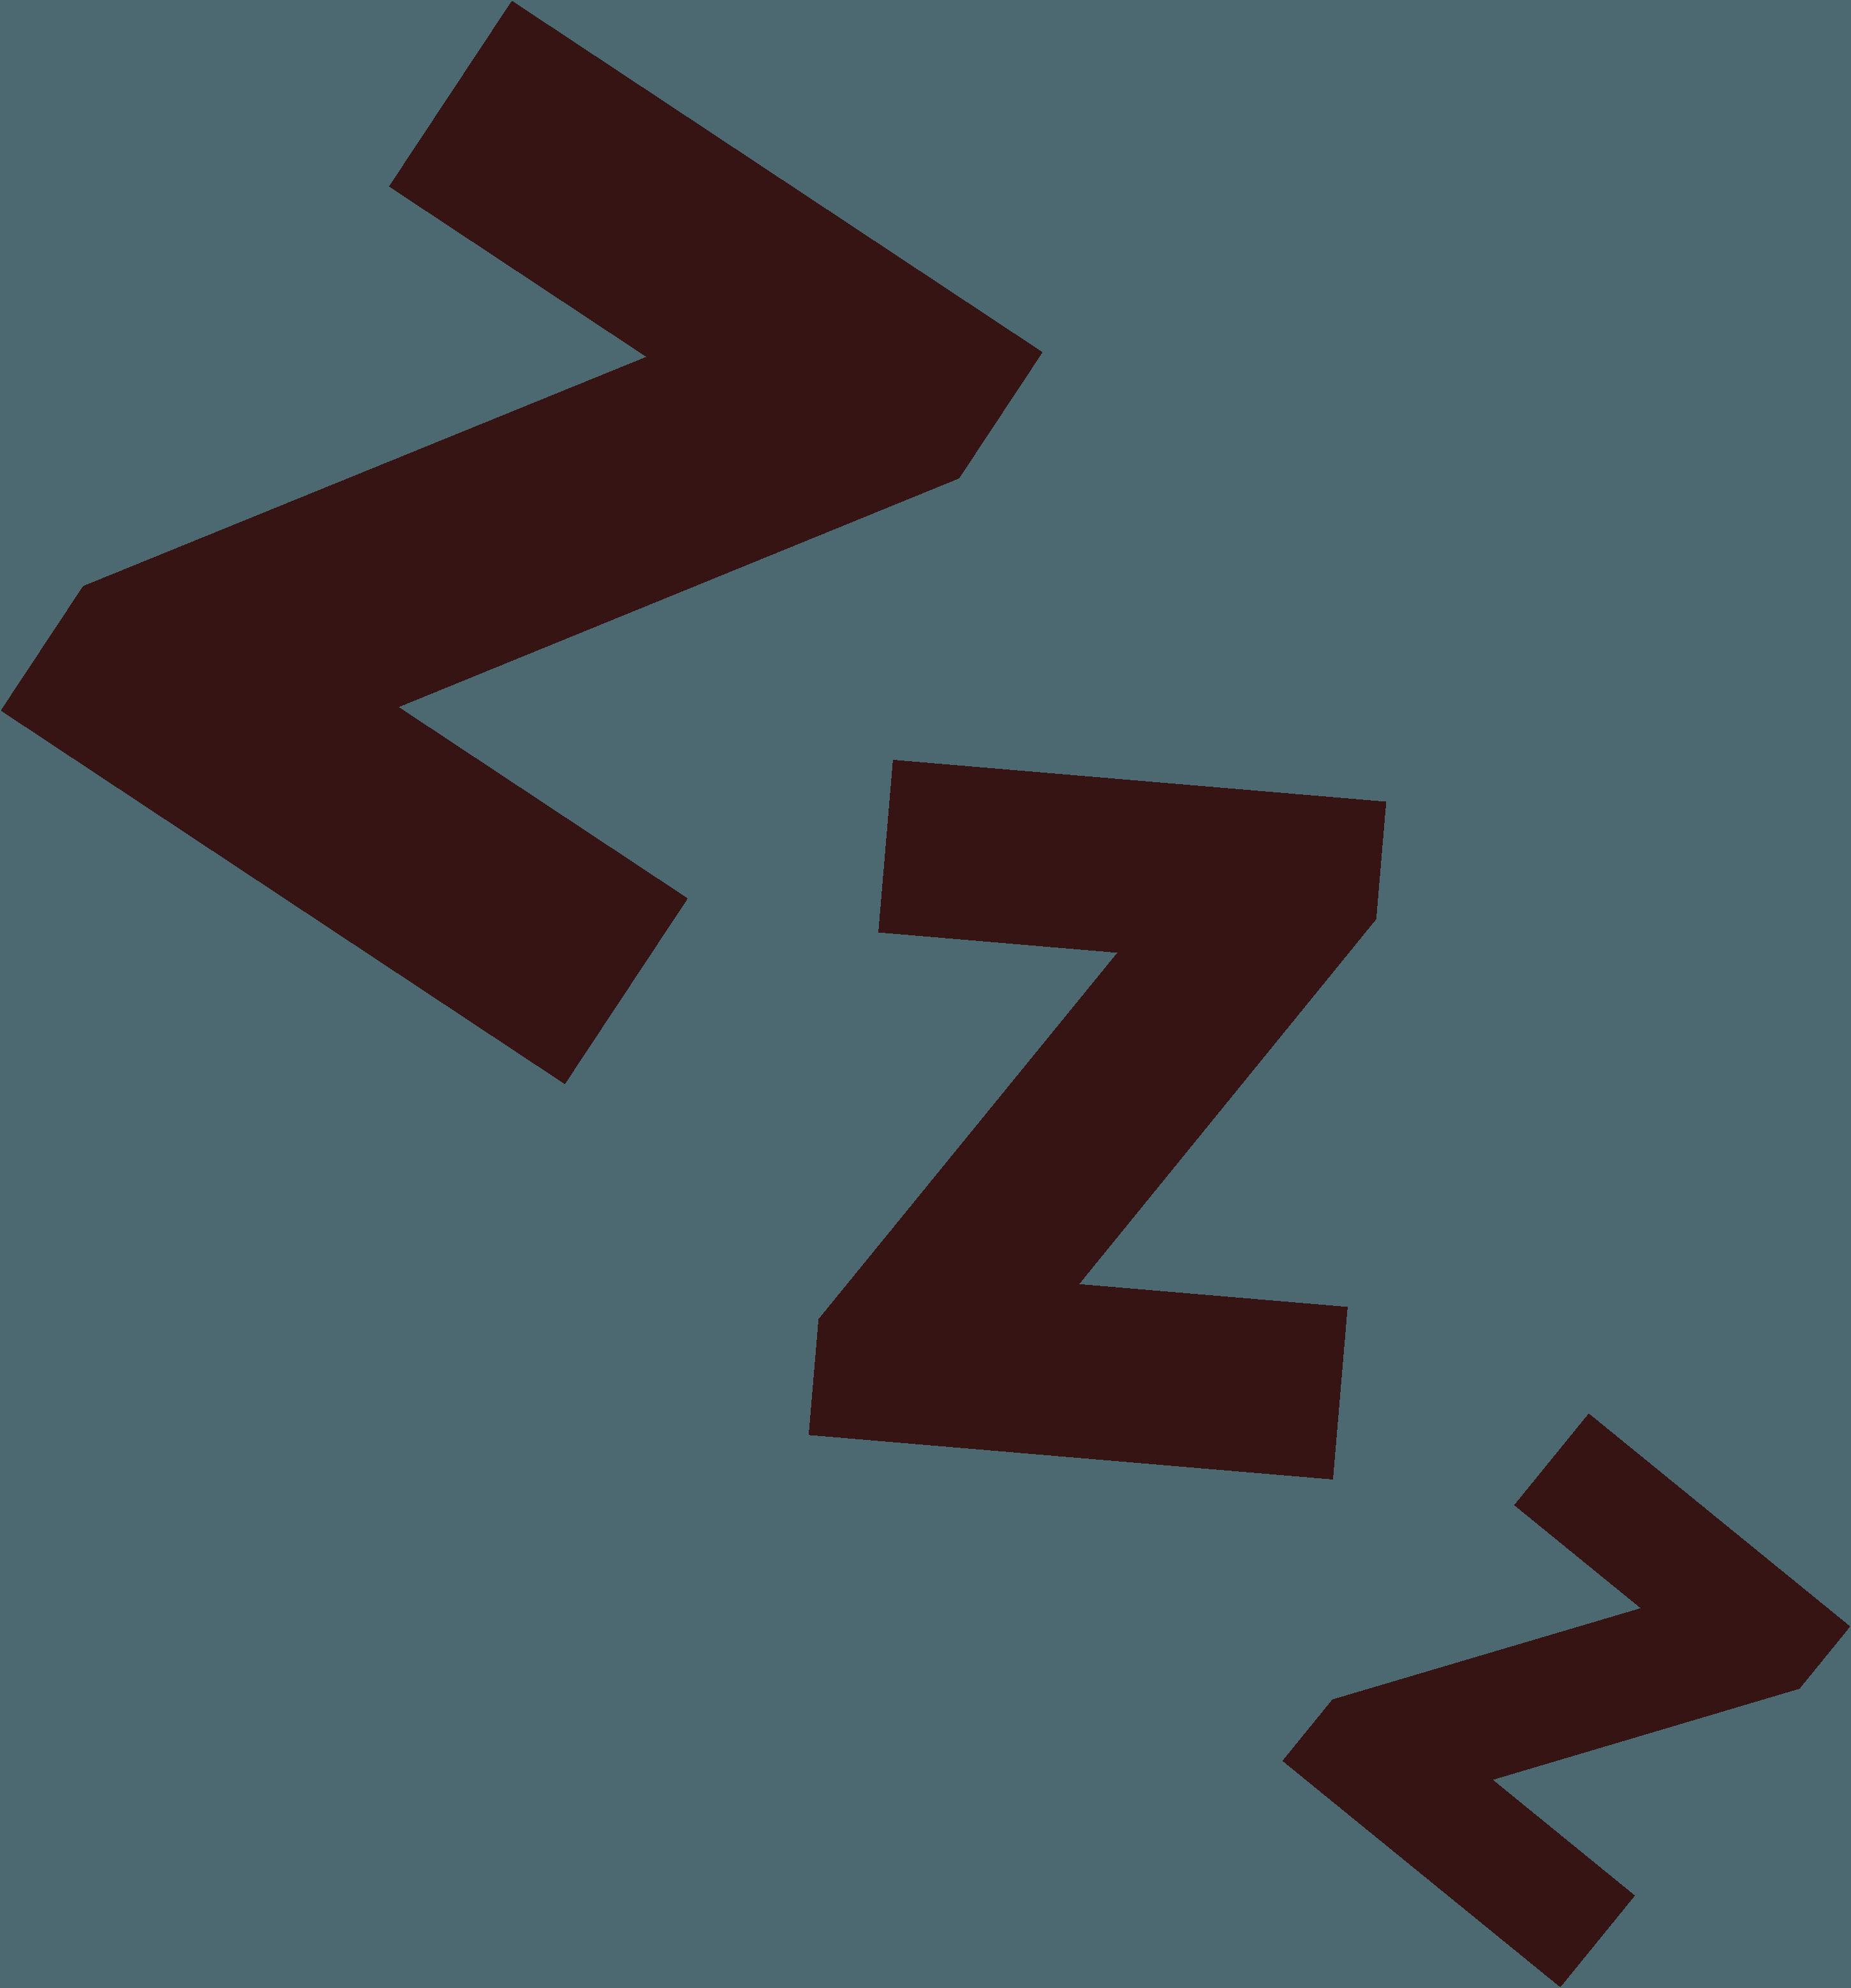 Sleeping clipart zzz, Sleeping zzz Transparent FREE for ...